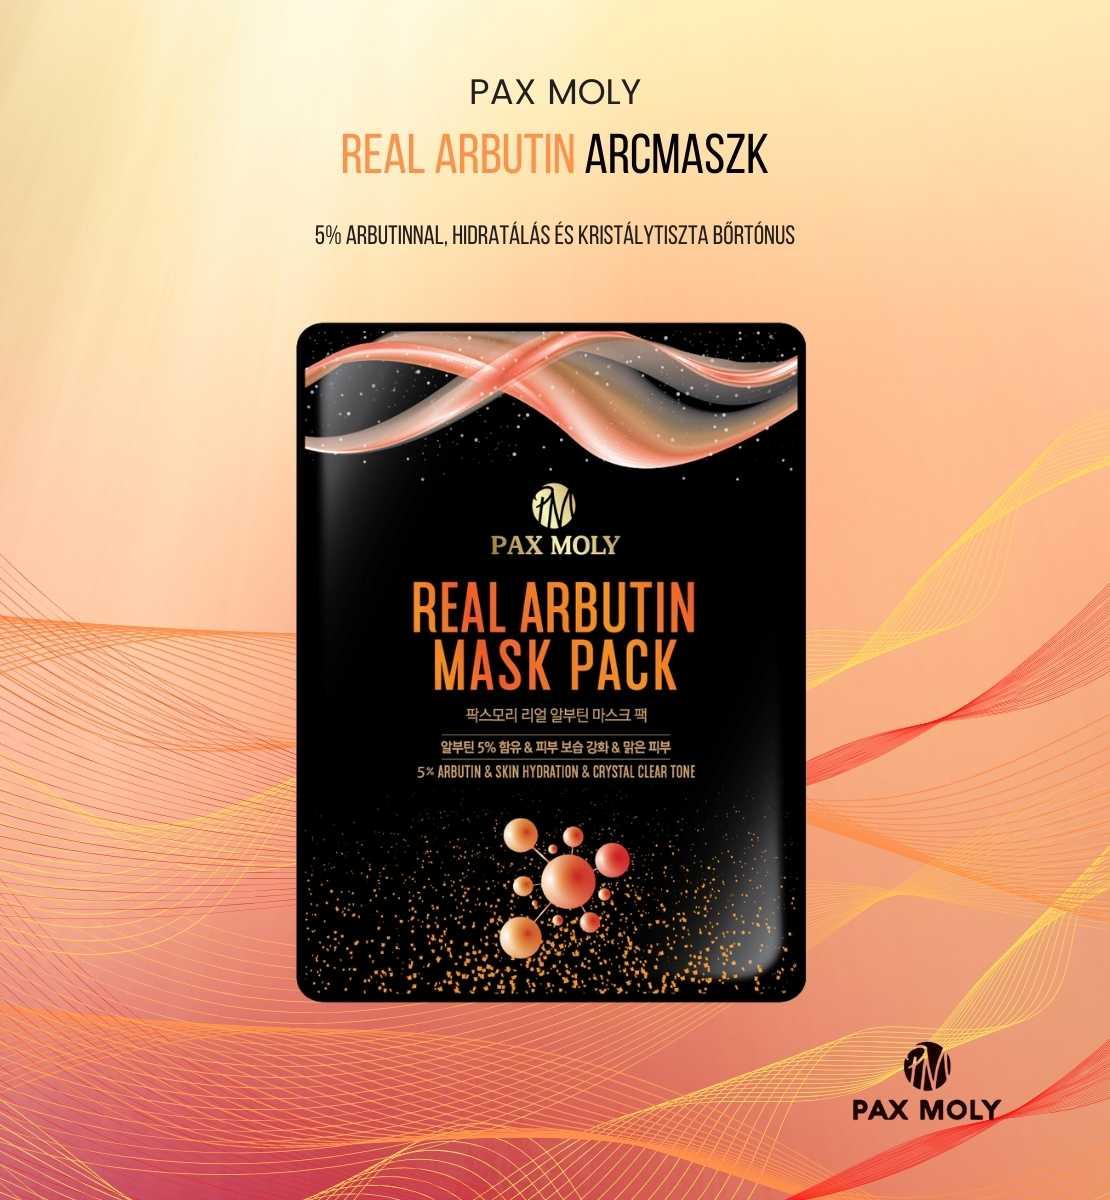 paxmoly-real-arbutin-arcmaszk